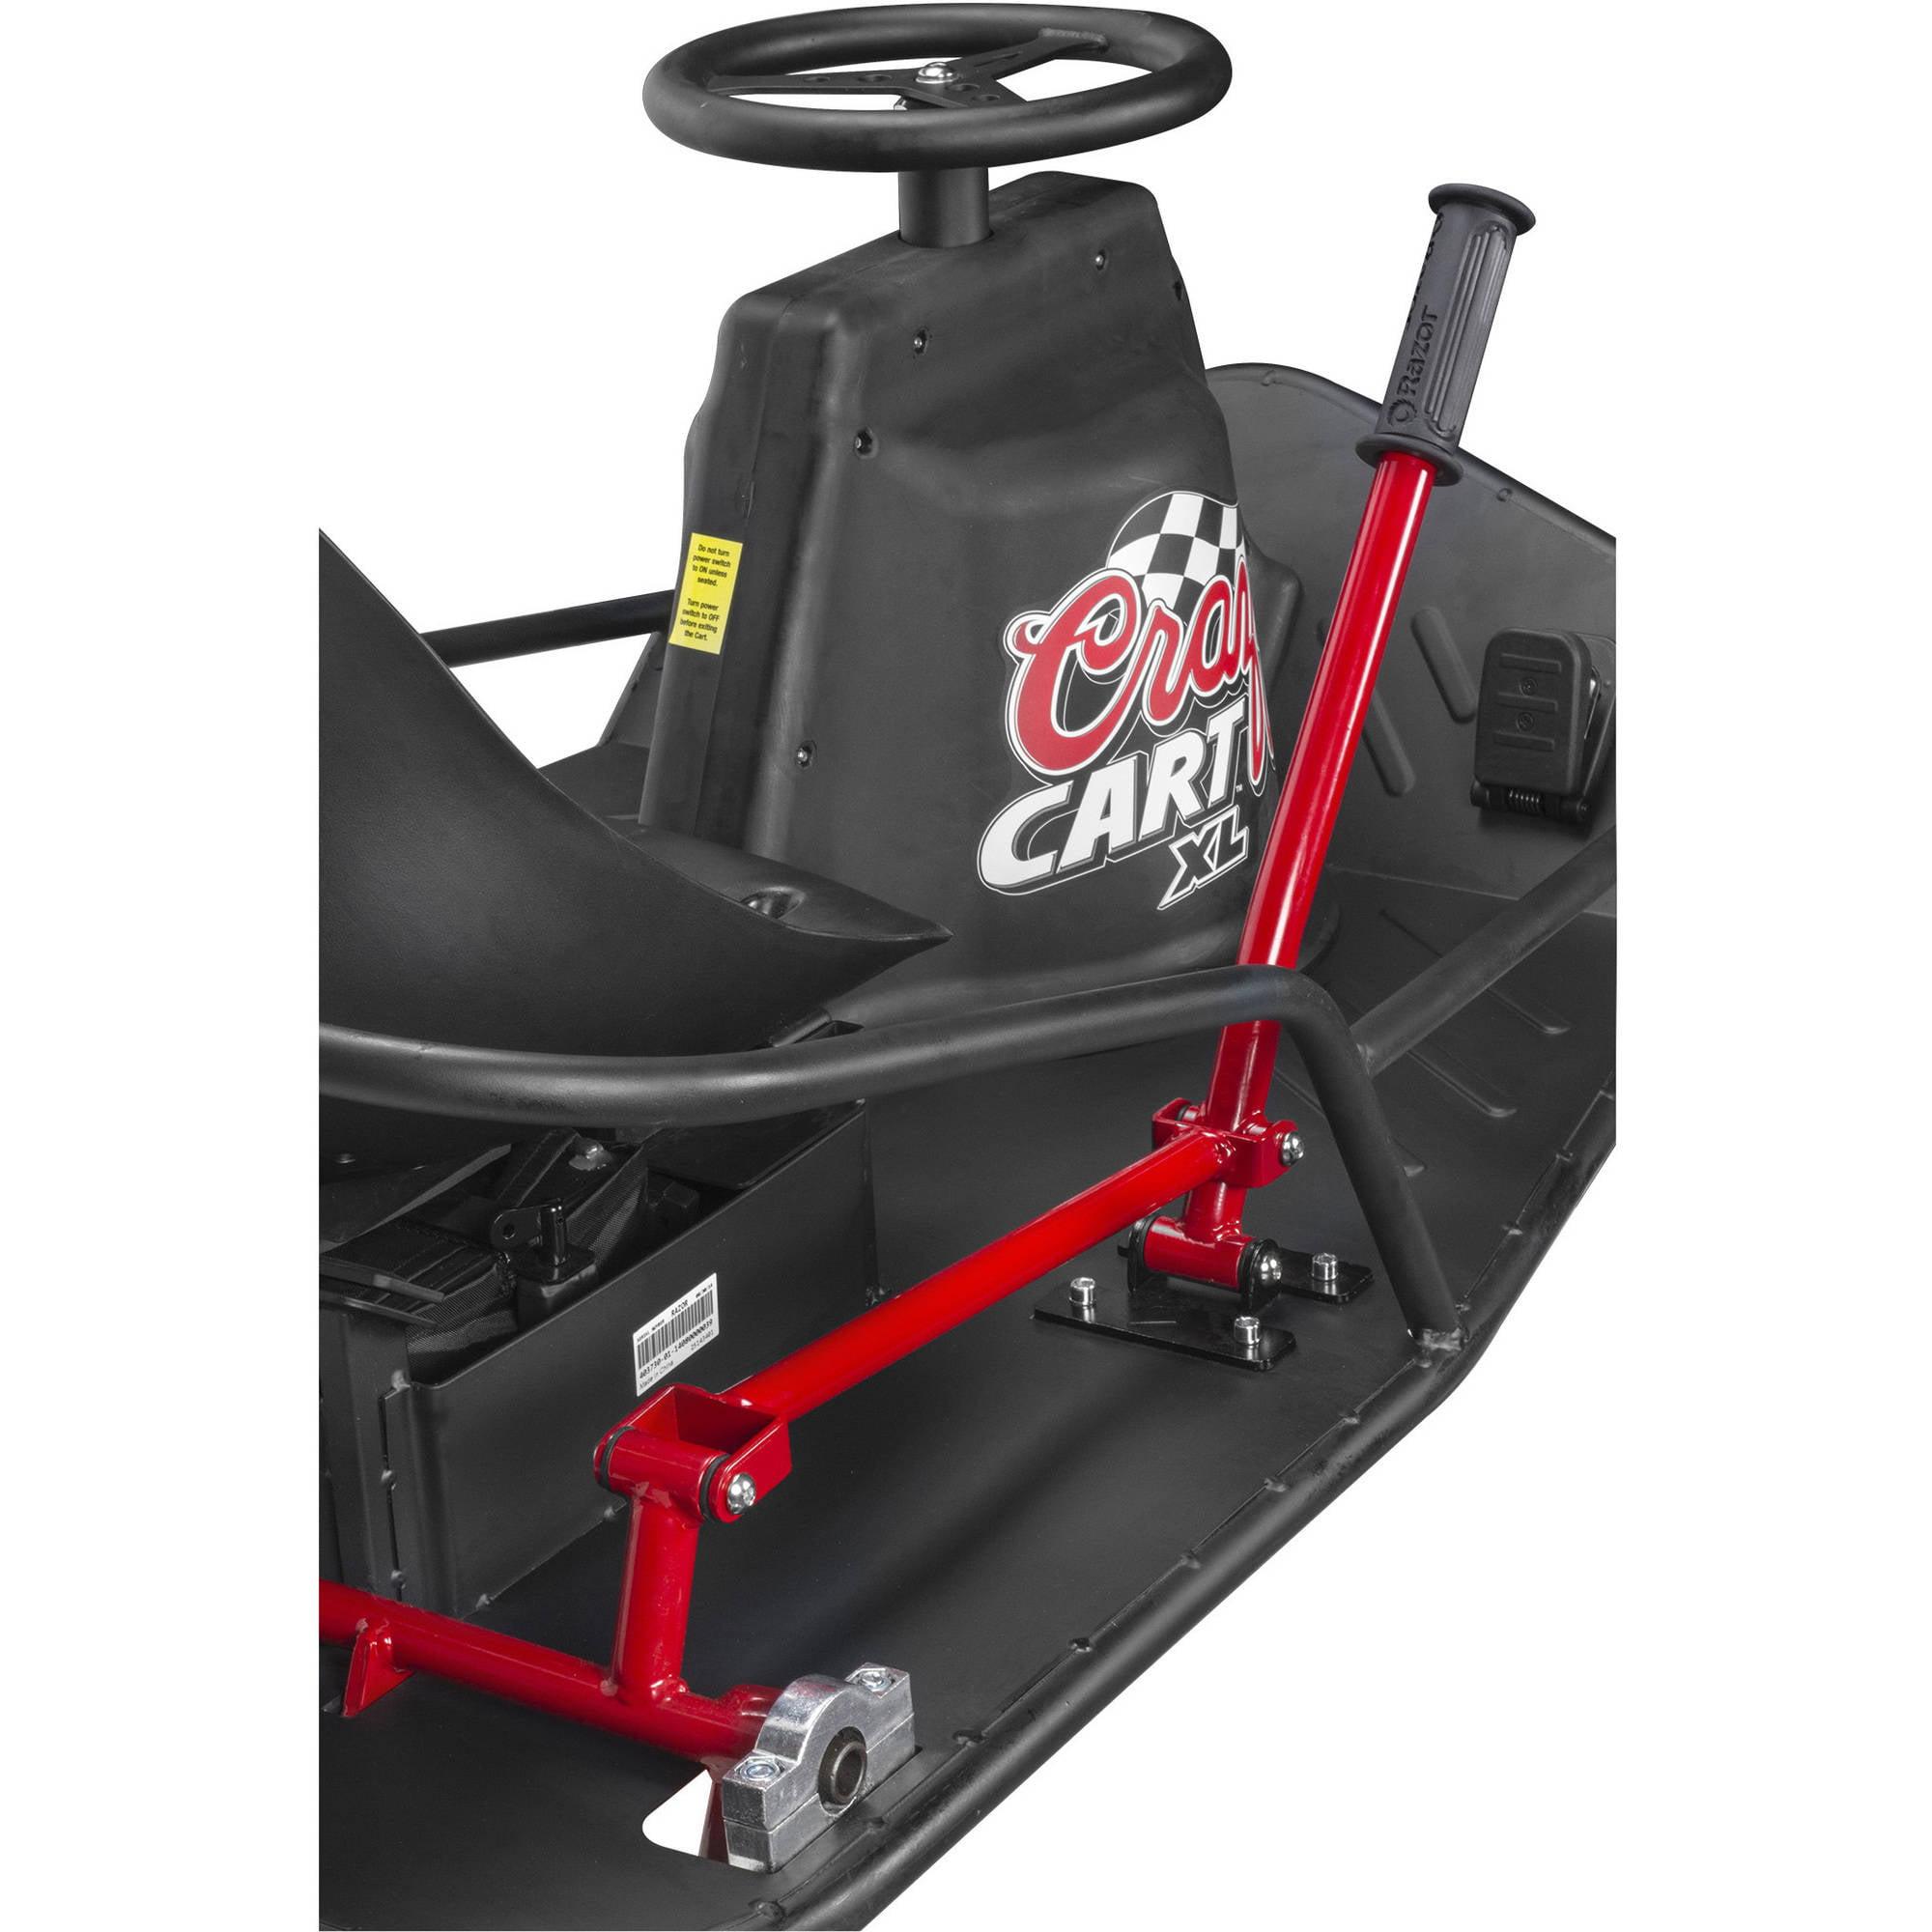 Crazy Cart Électrique Kit Performance Controller Upgrade 36 V XL